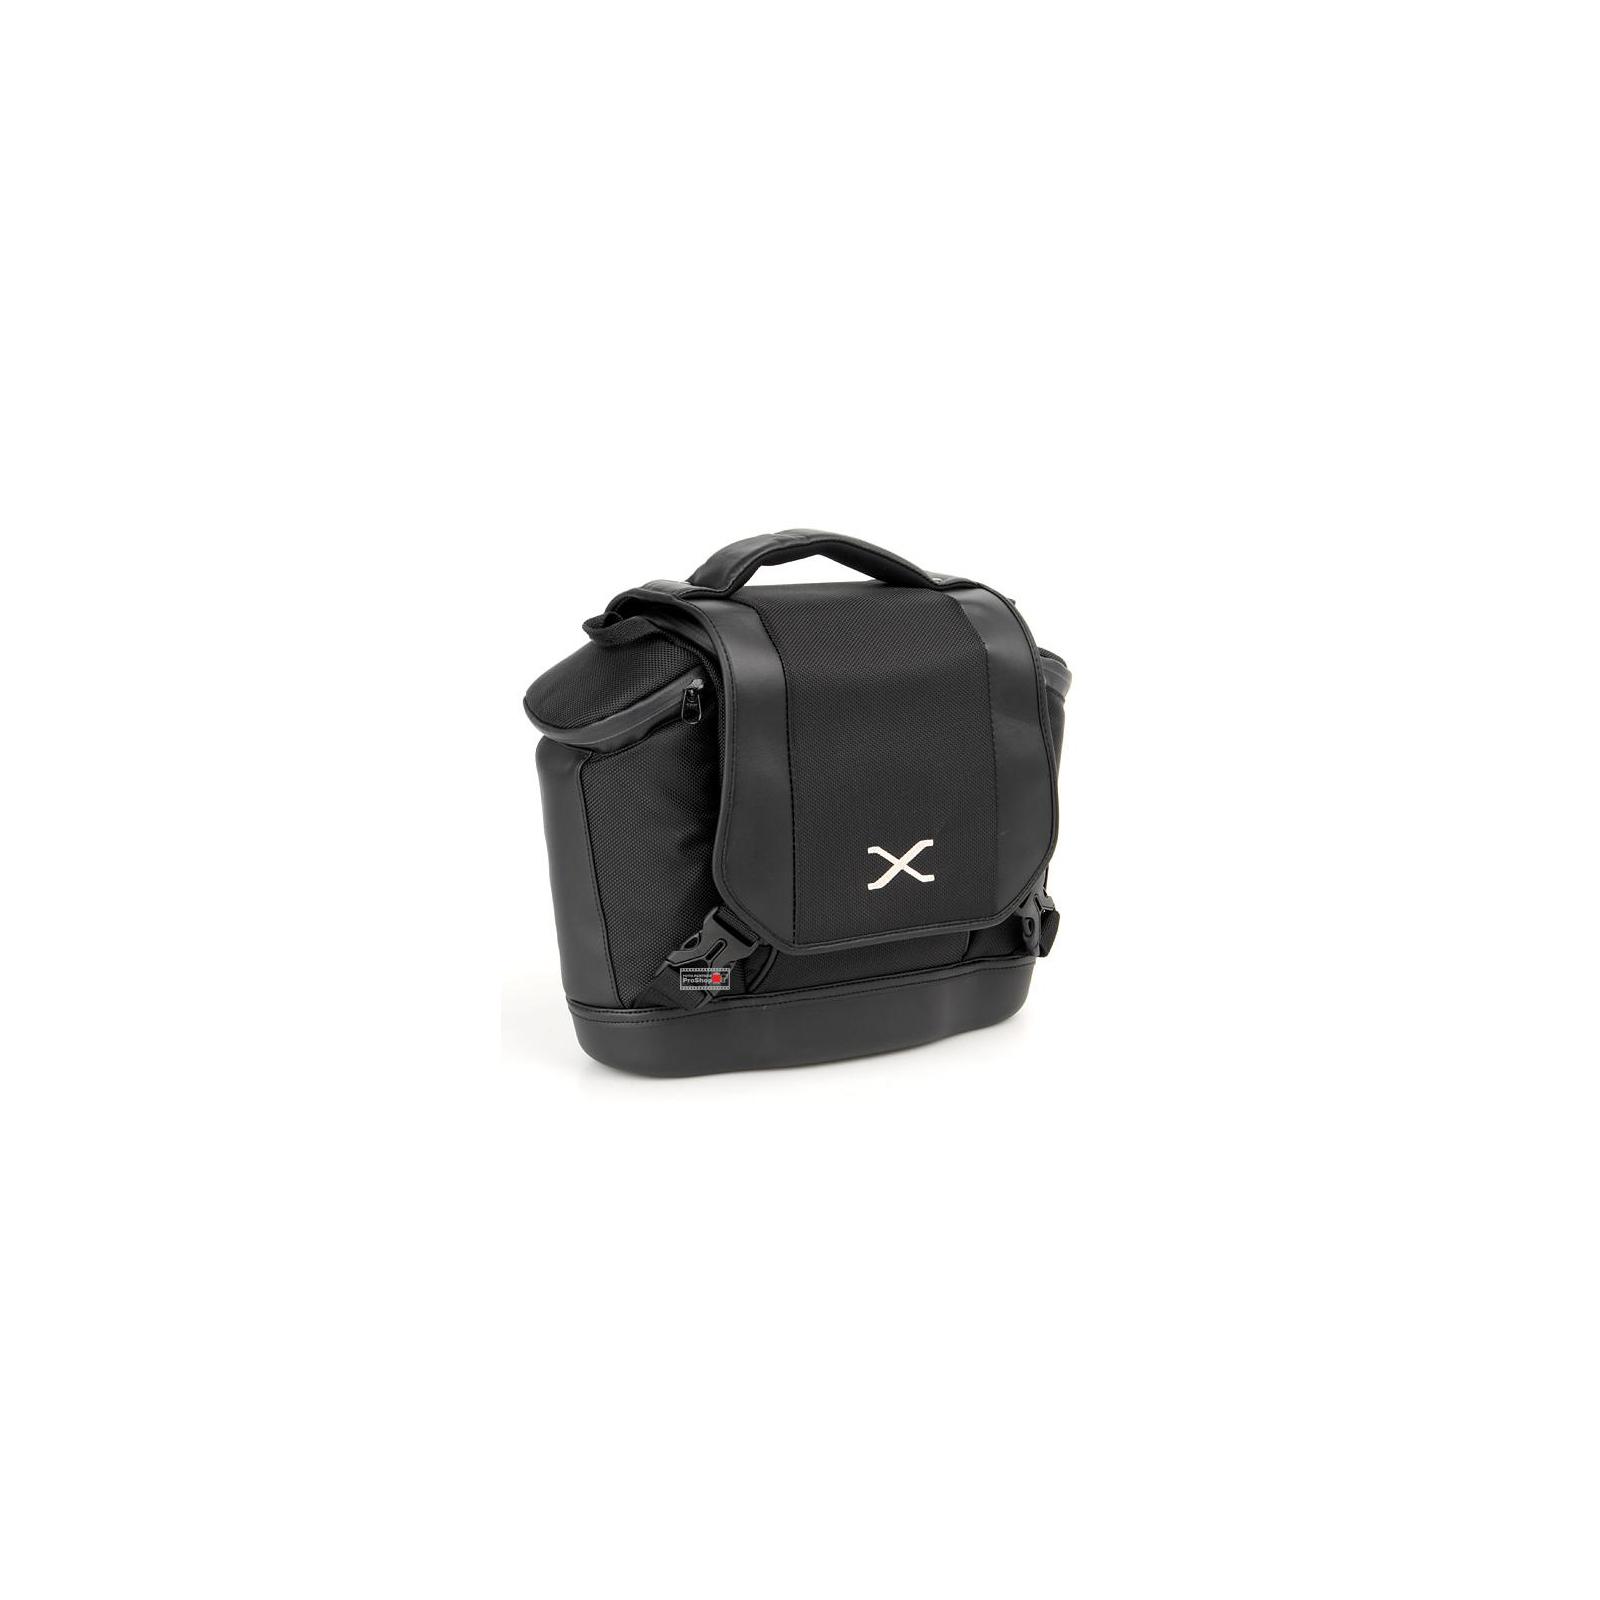 Фото-сумка Fujifilm SC-X black (04004455)